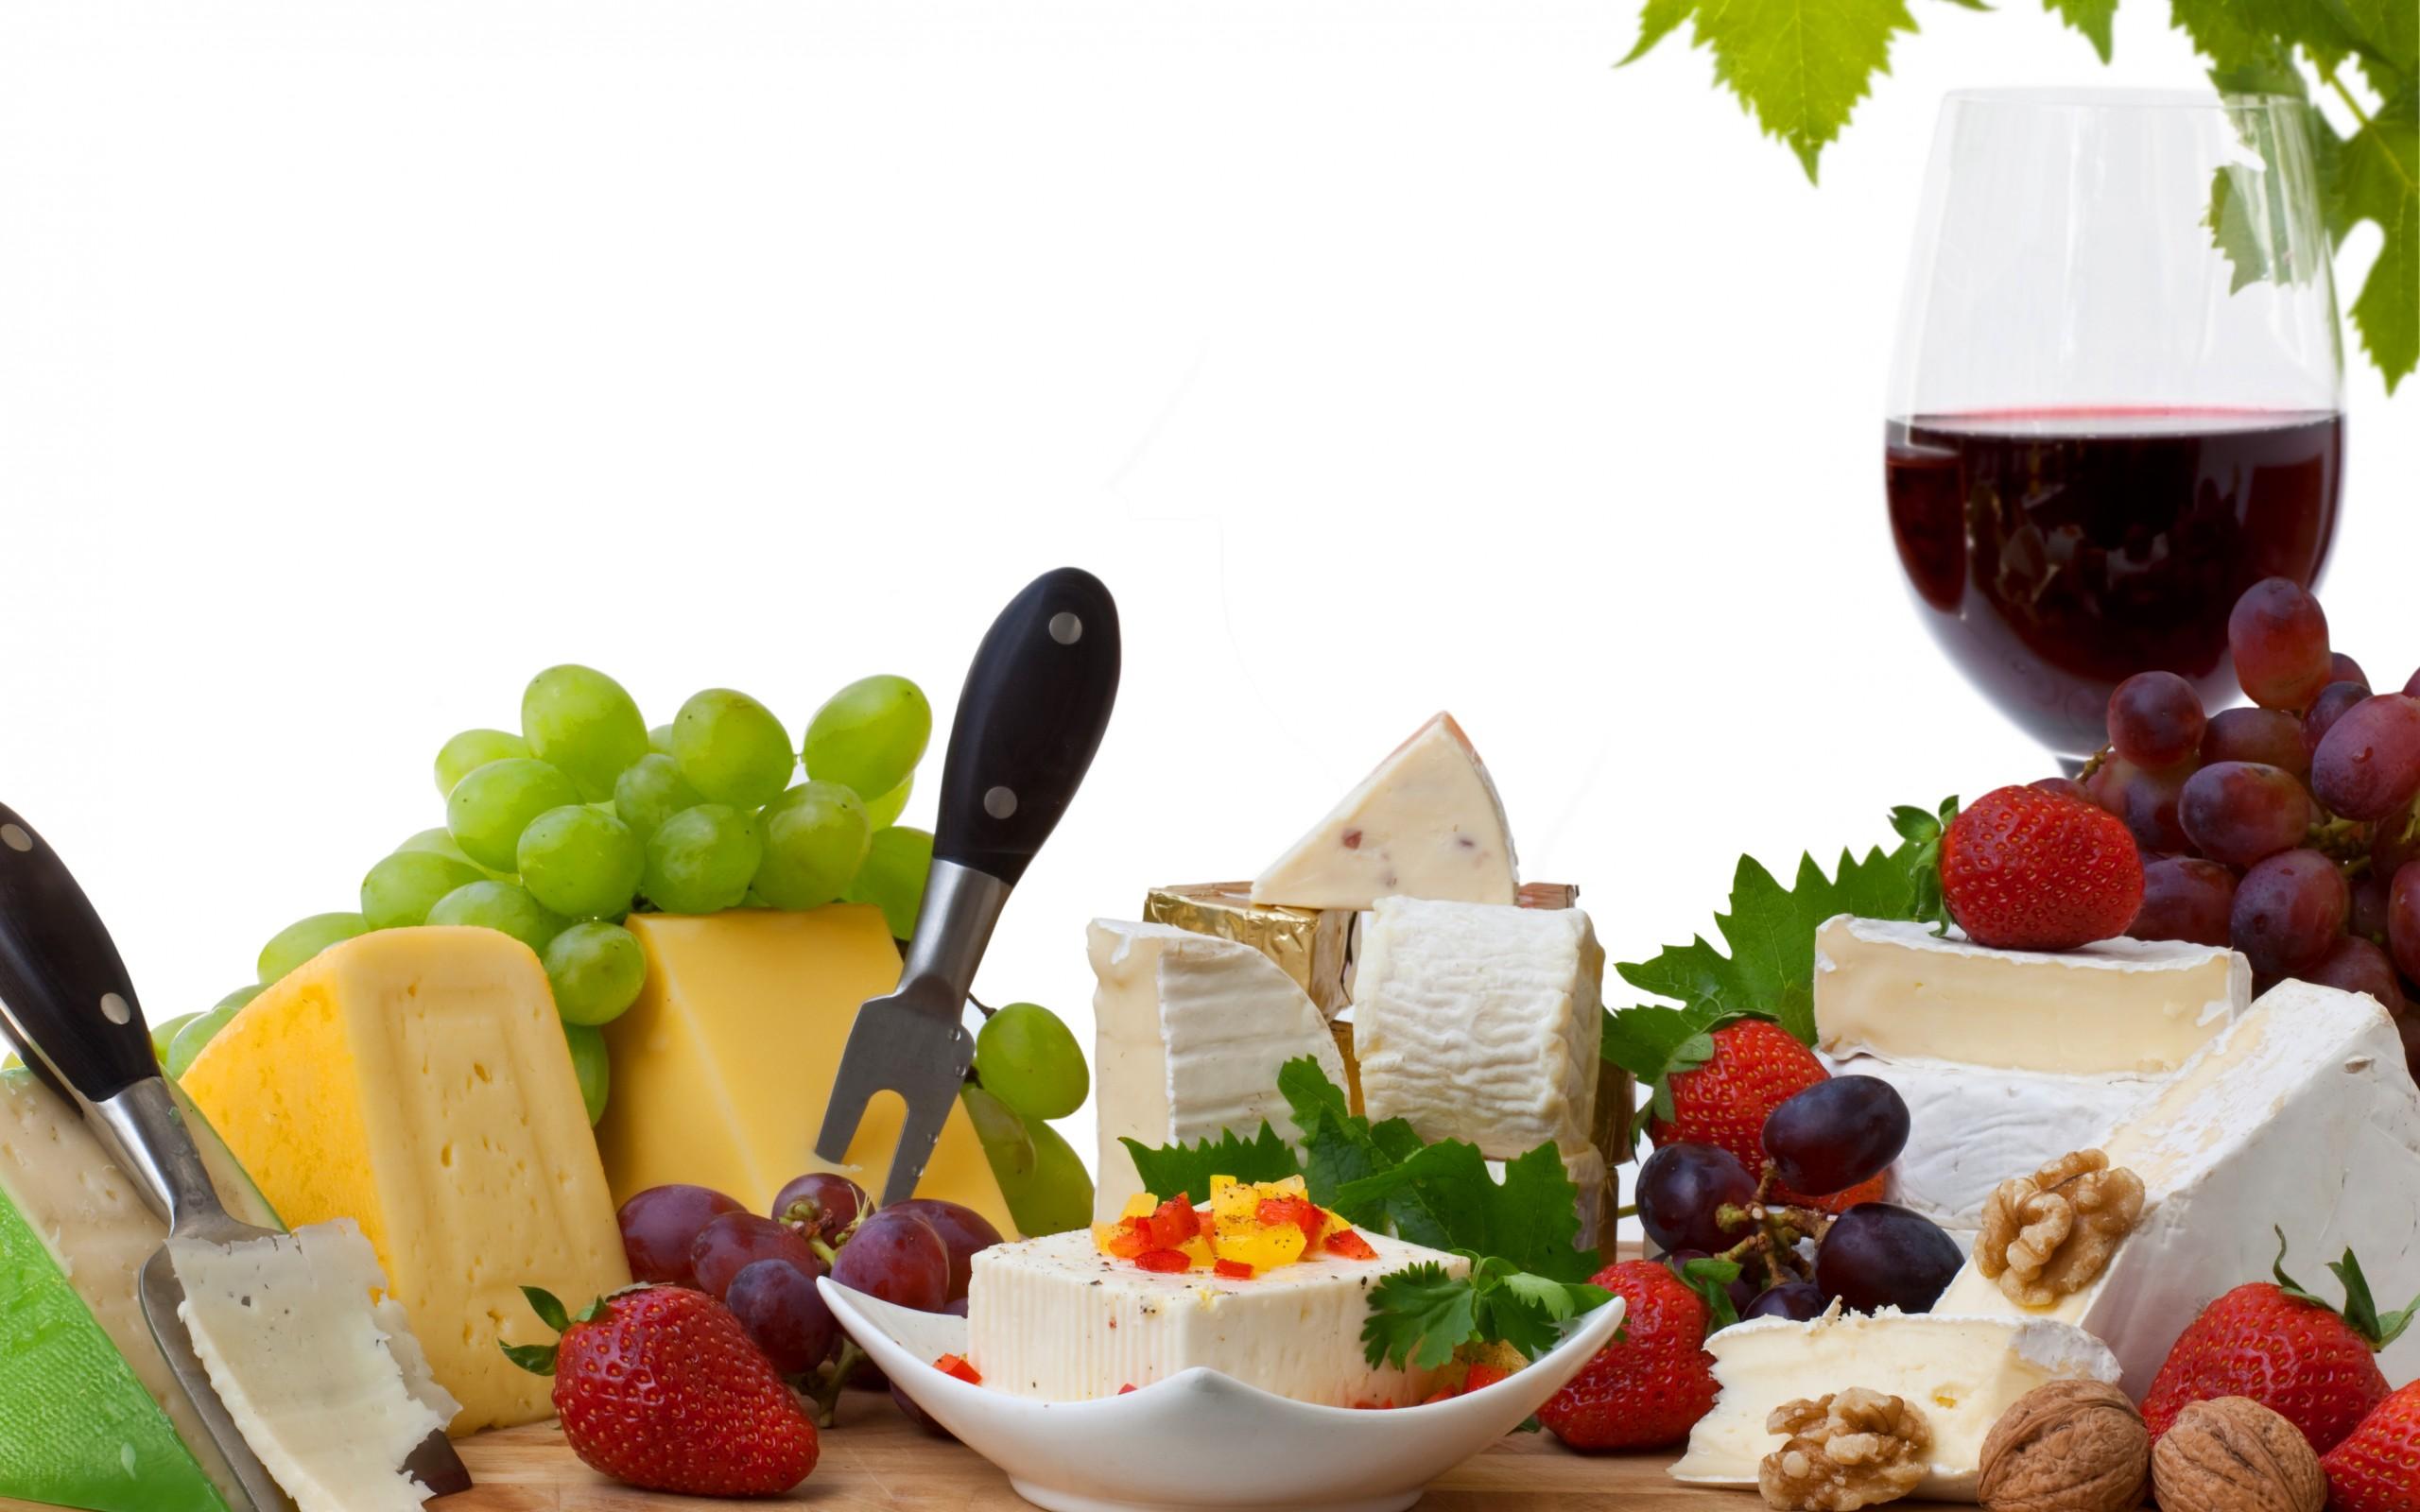 еда вино  № 598729 бесплатно